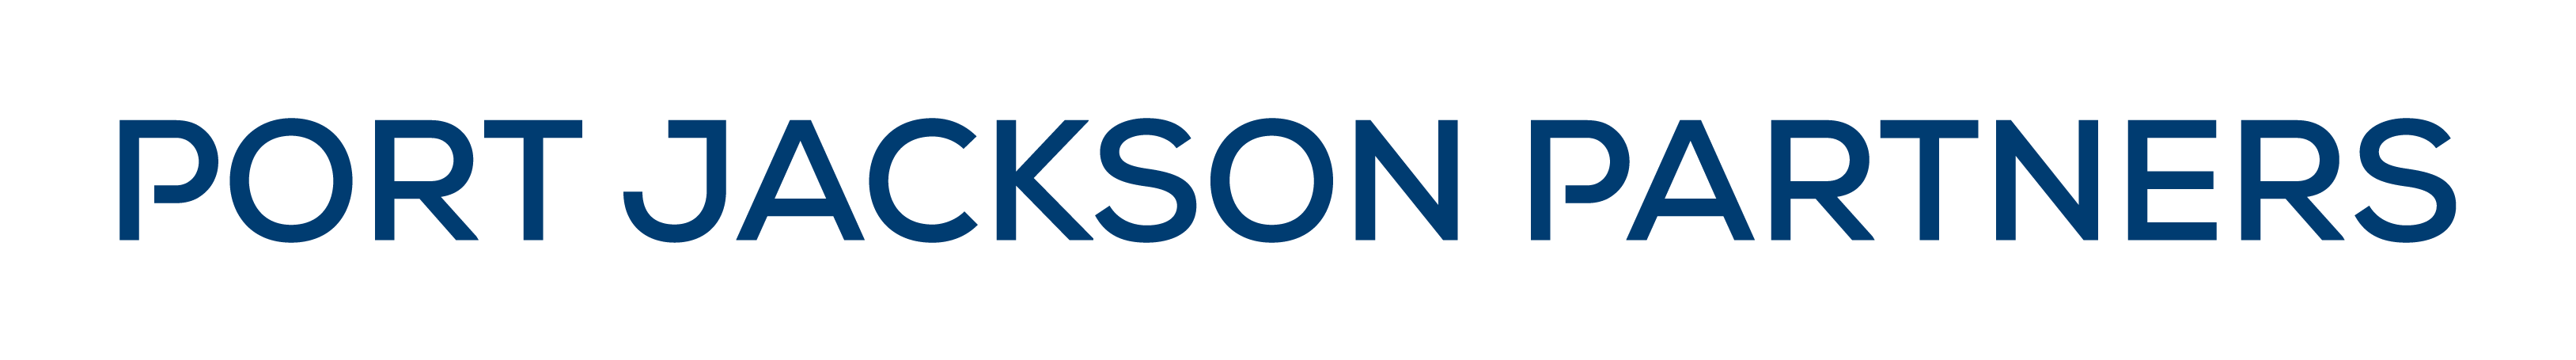 Port Jackson Partners logo